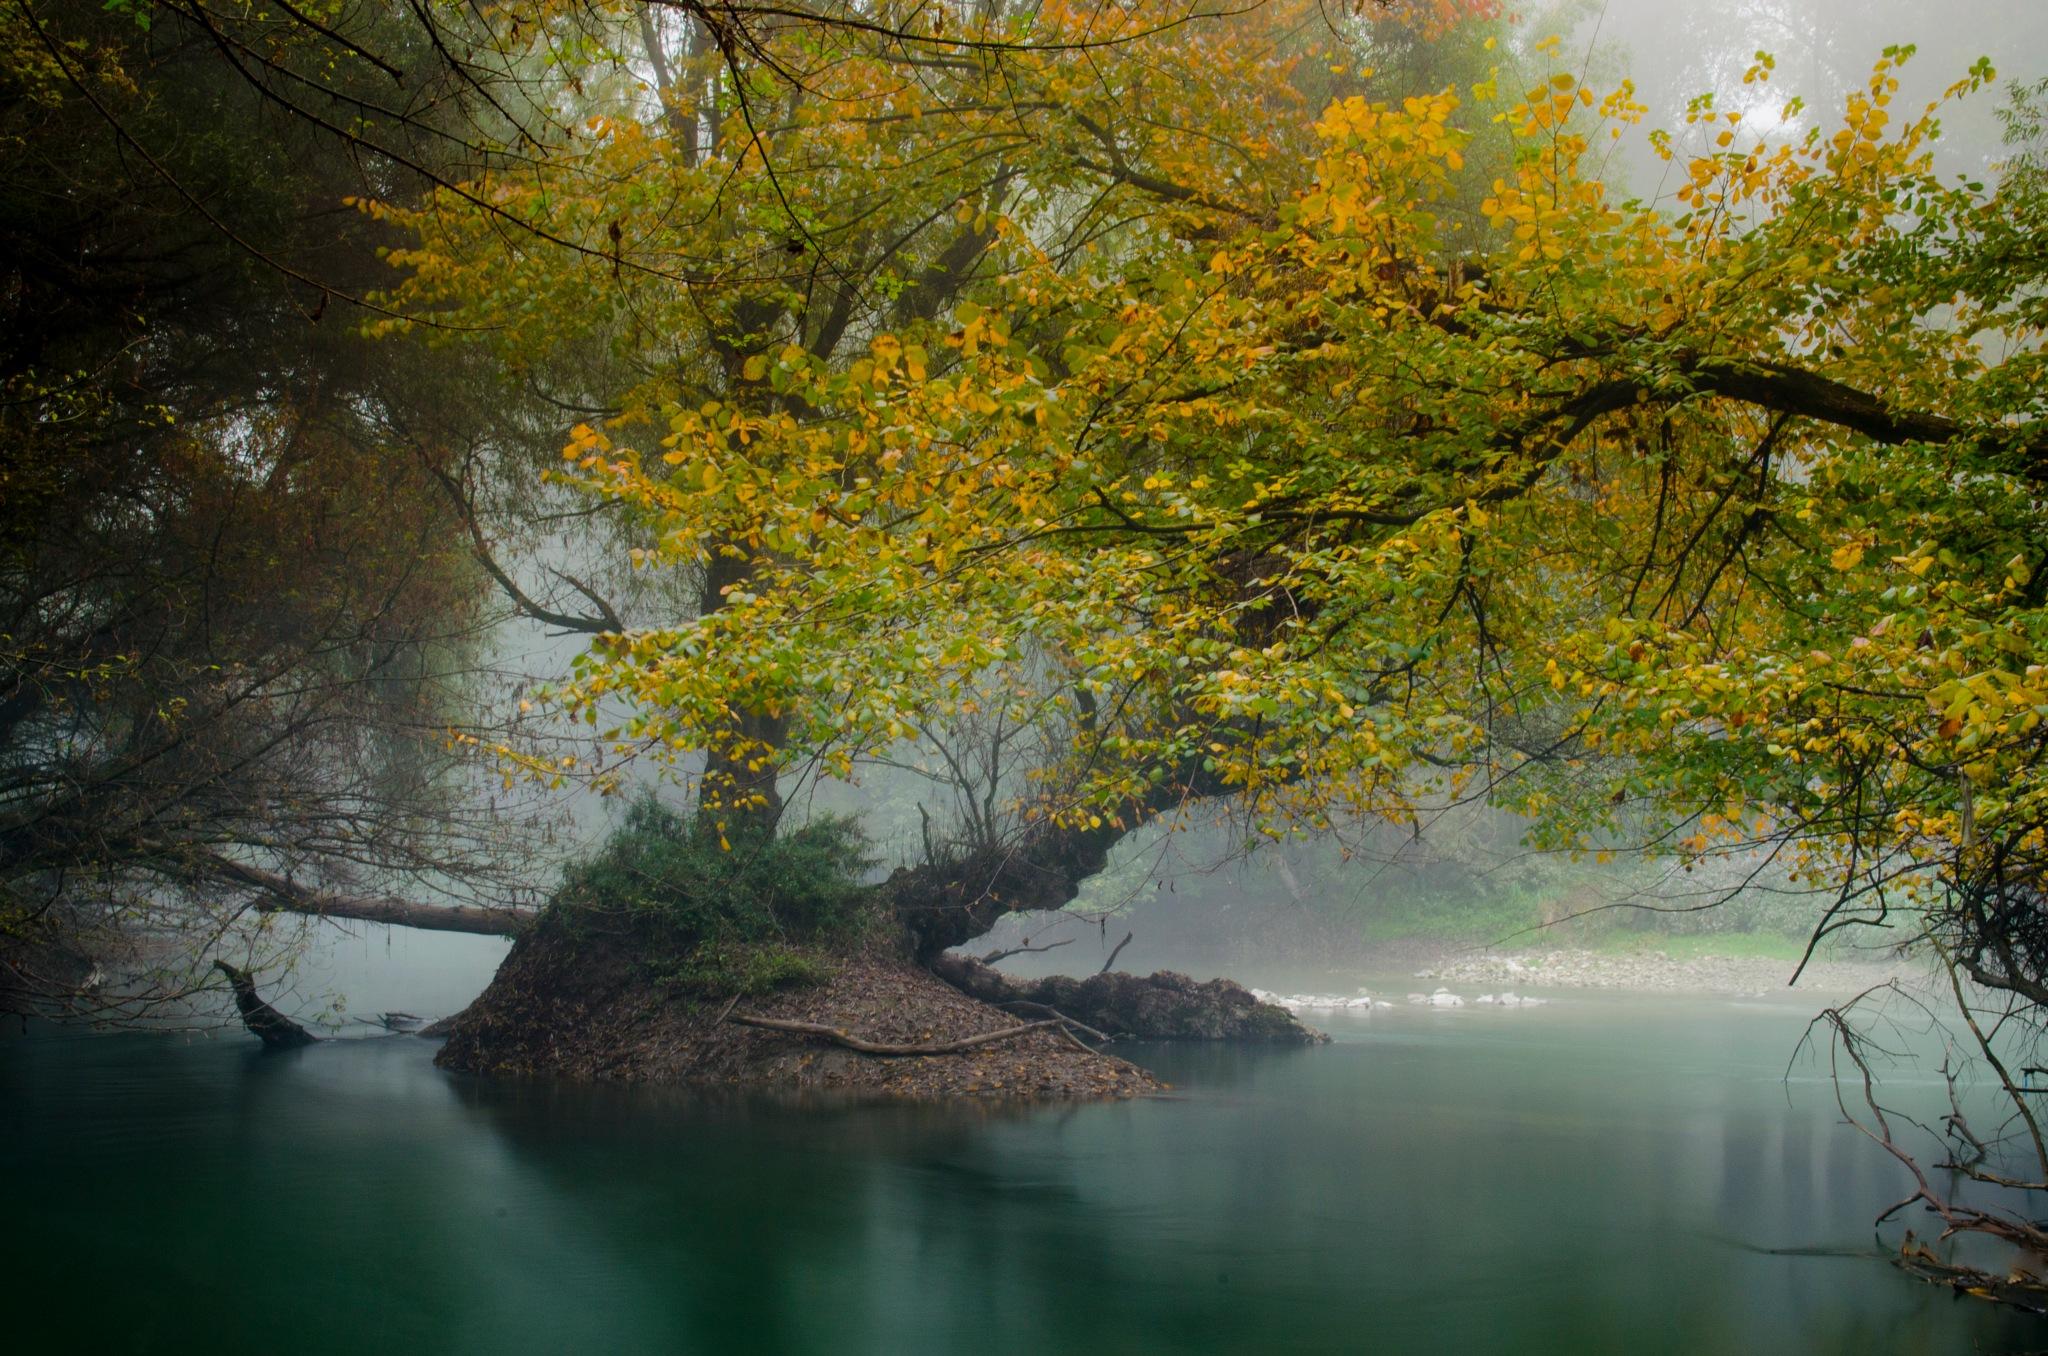 Autumn calm by Kovacs Krisztian